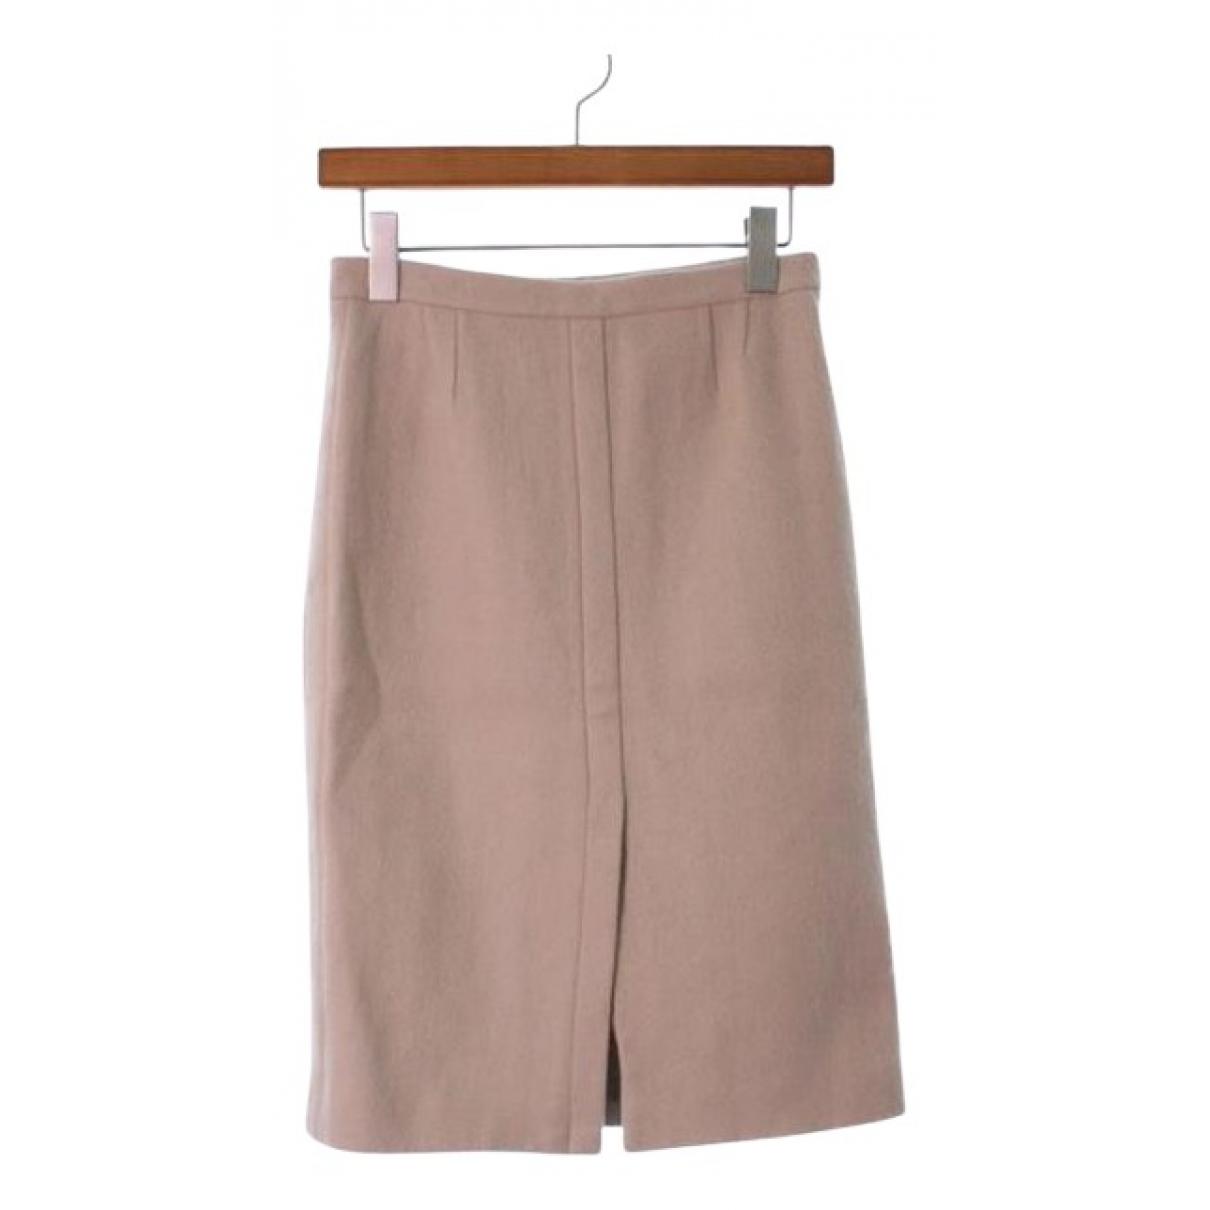 Maison Martin Margiela N Beige Wool skirt for Women 40 IT